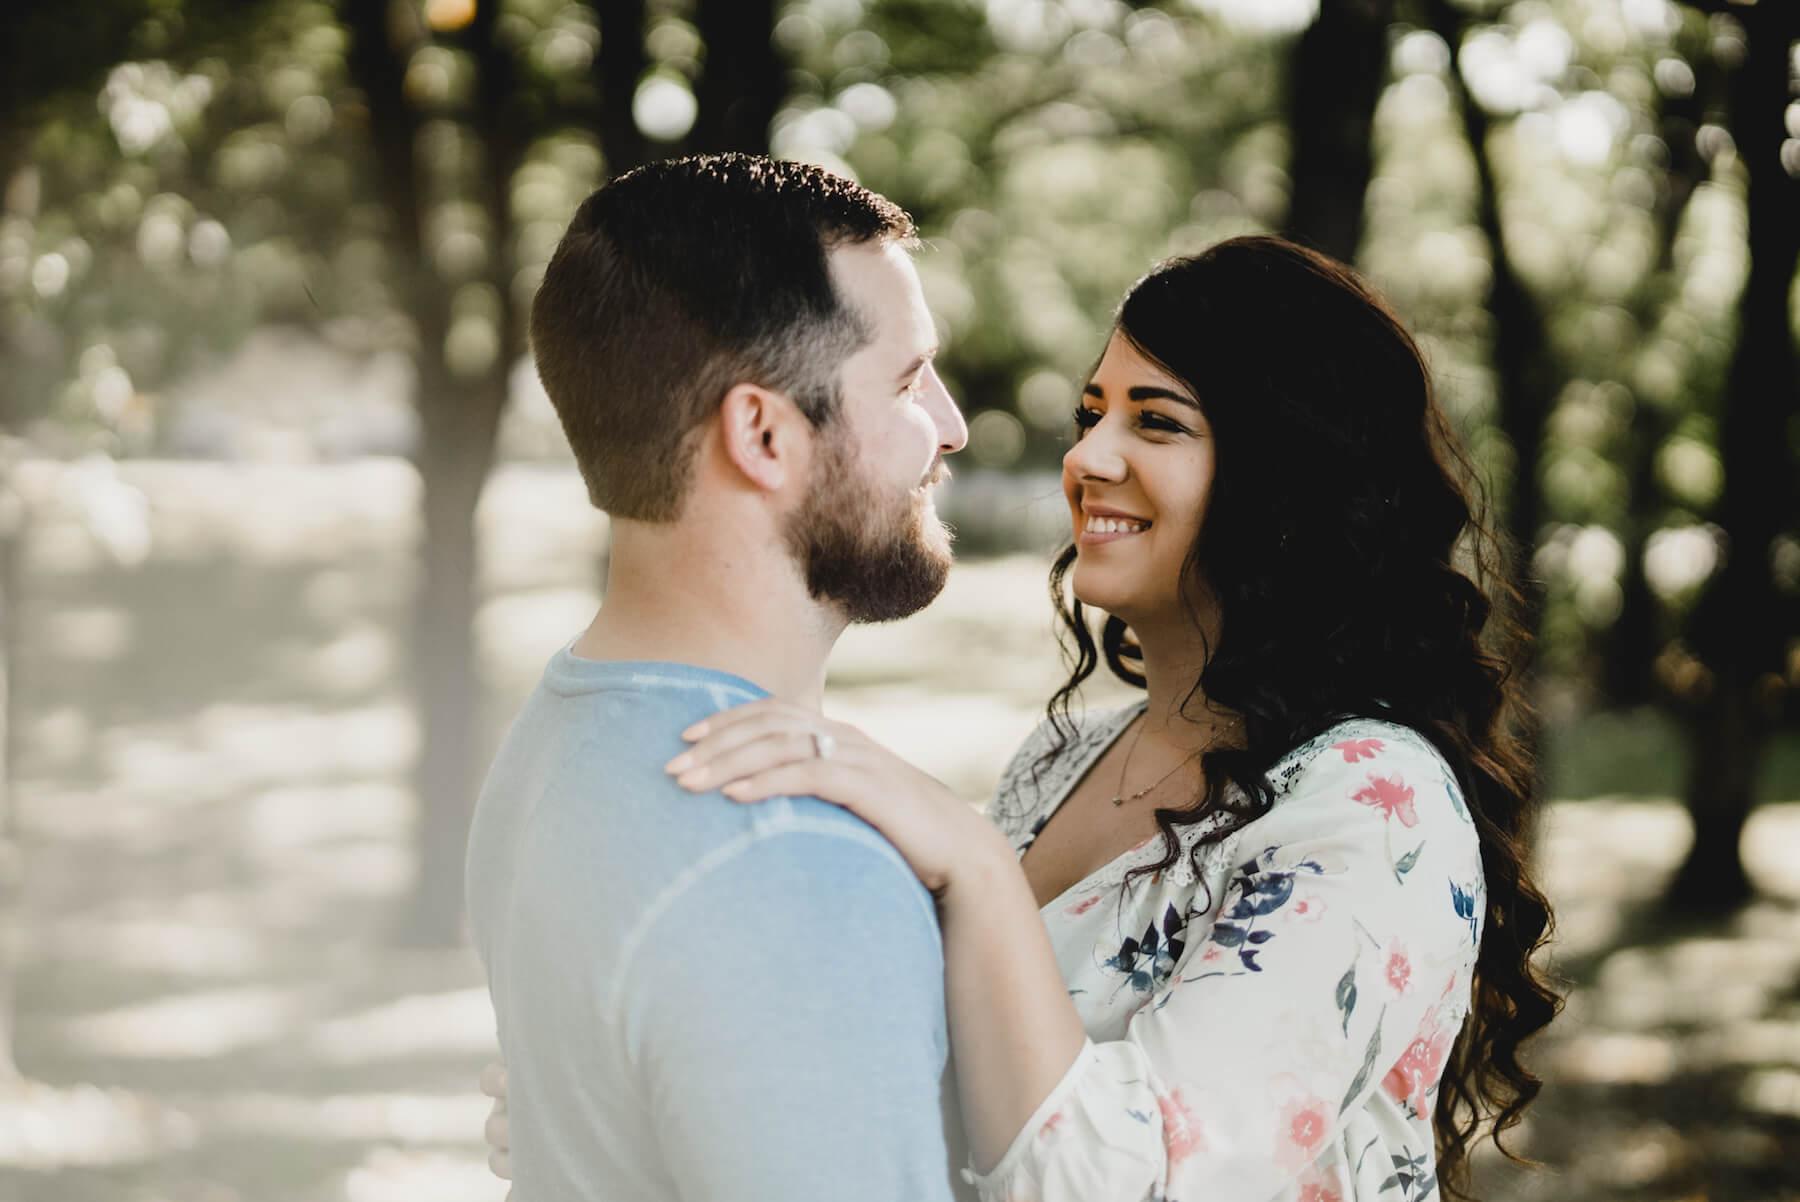 Engle-Olson-Chad-Jen-Engagement-13.jpg